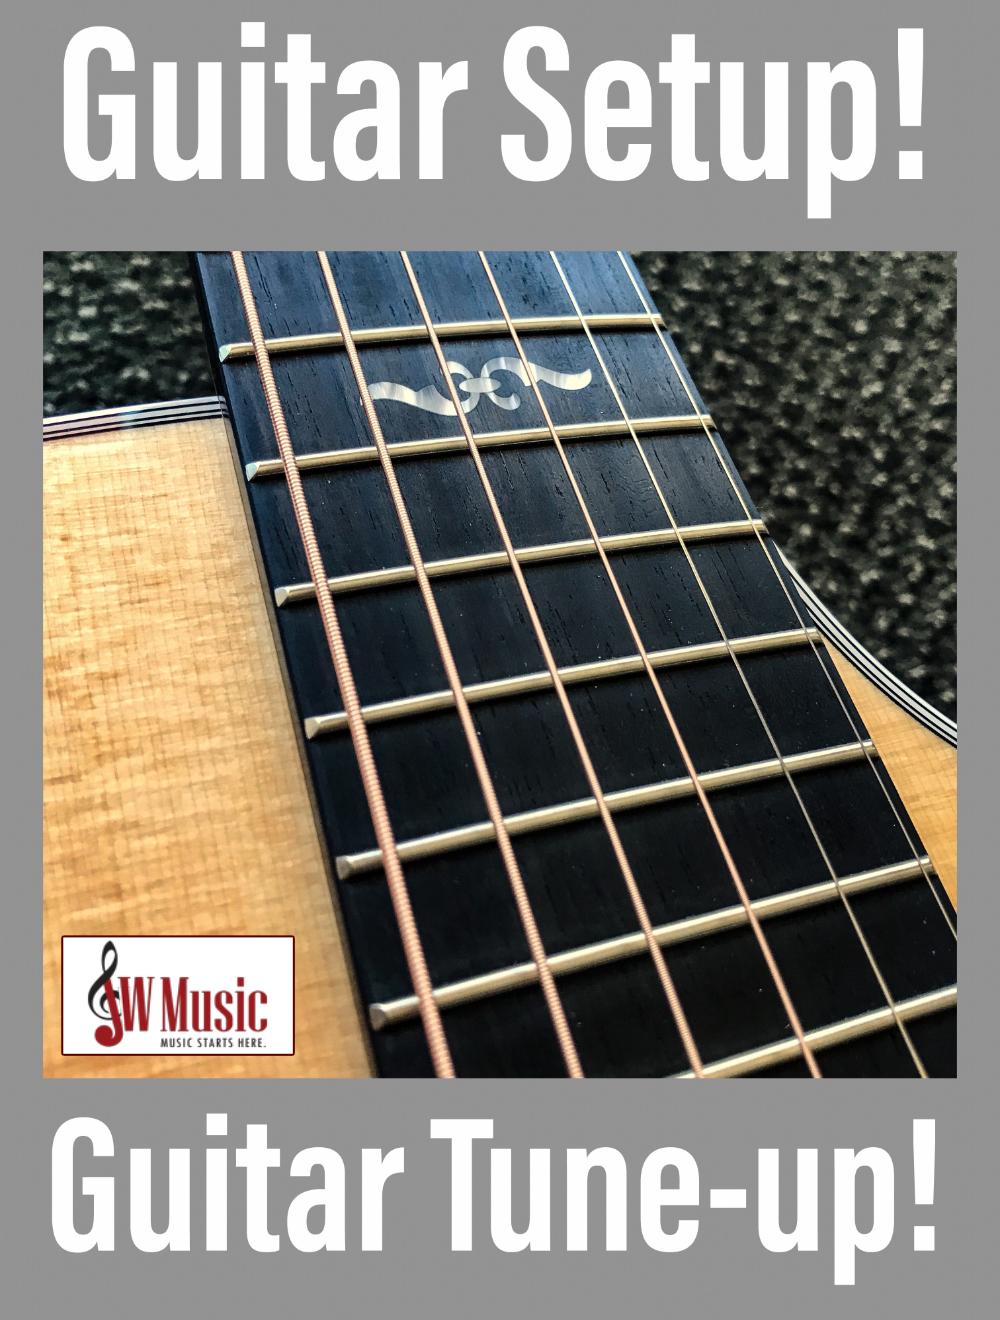 Guitar Tune-ups at JW Music!